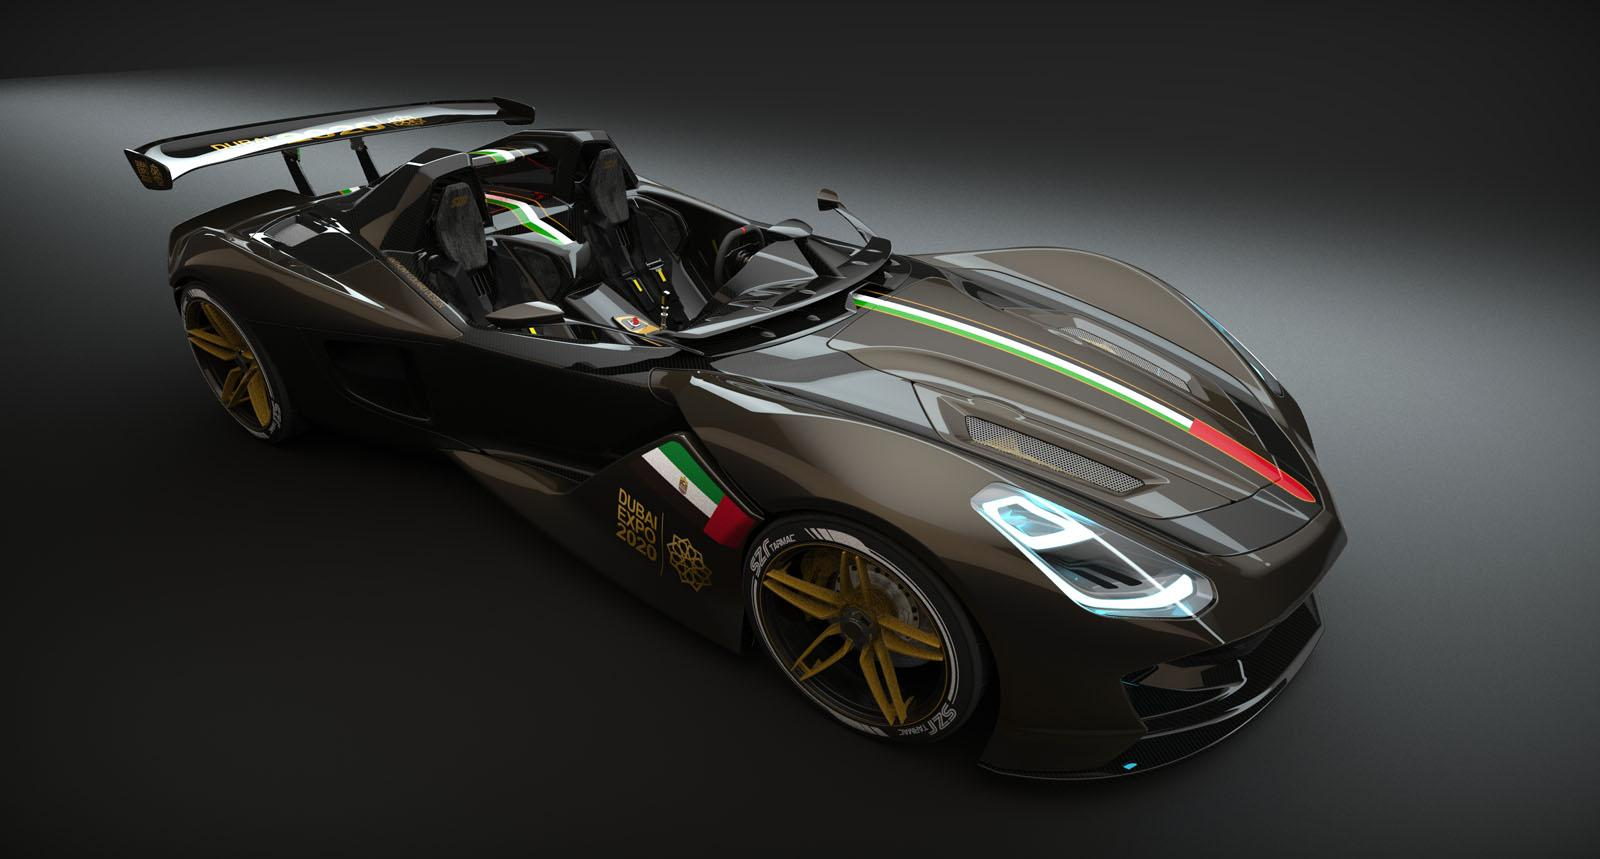 Bac Mono For Sale >> Dubai Roadster Sports Car Imagined - GTspirit